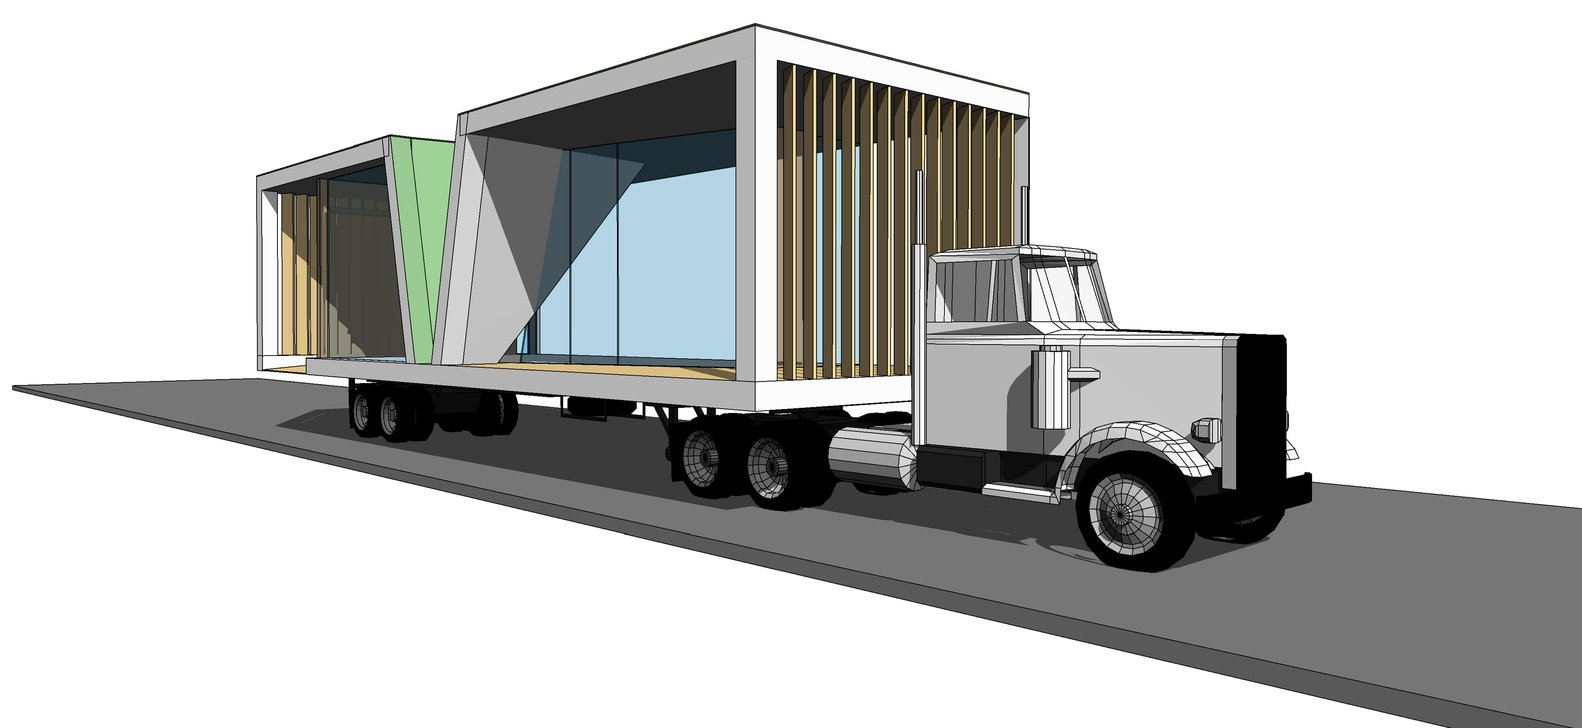 Future Proofing Schools Compeion Proposal Architectus Truck